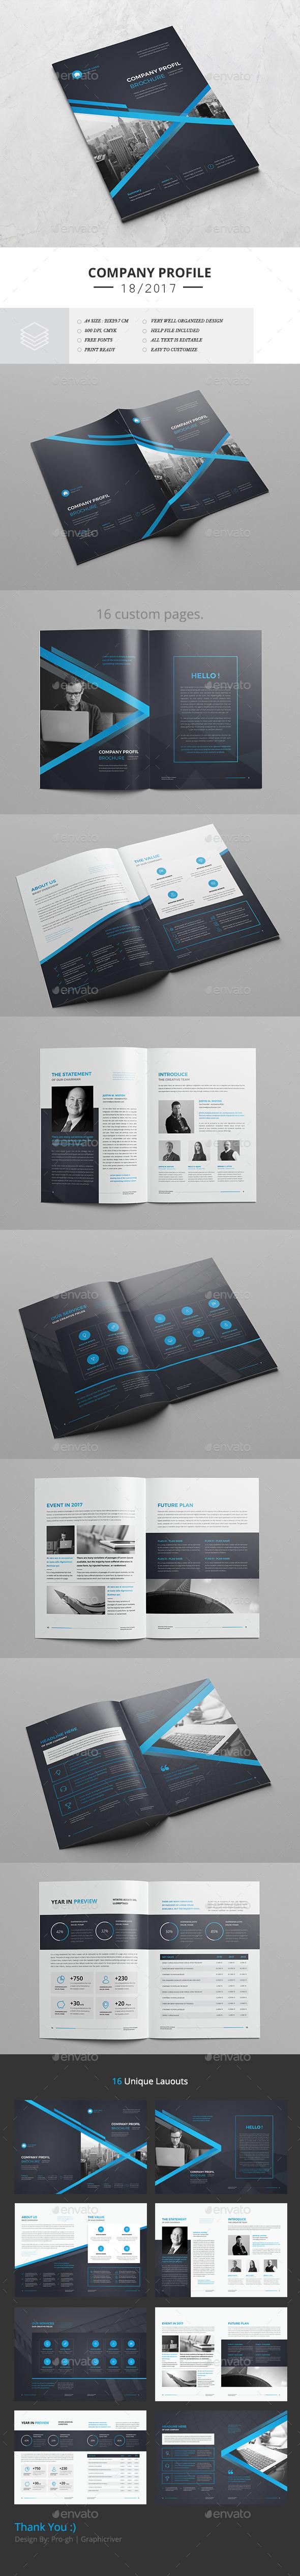 The Blue Corporate Brochure - Corporate Brochures